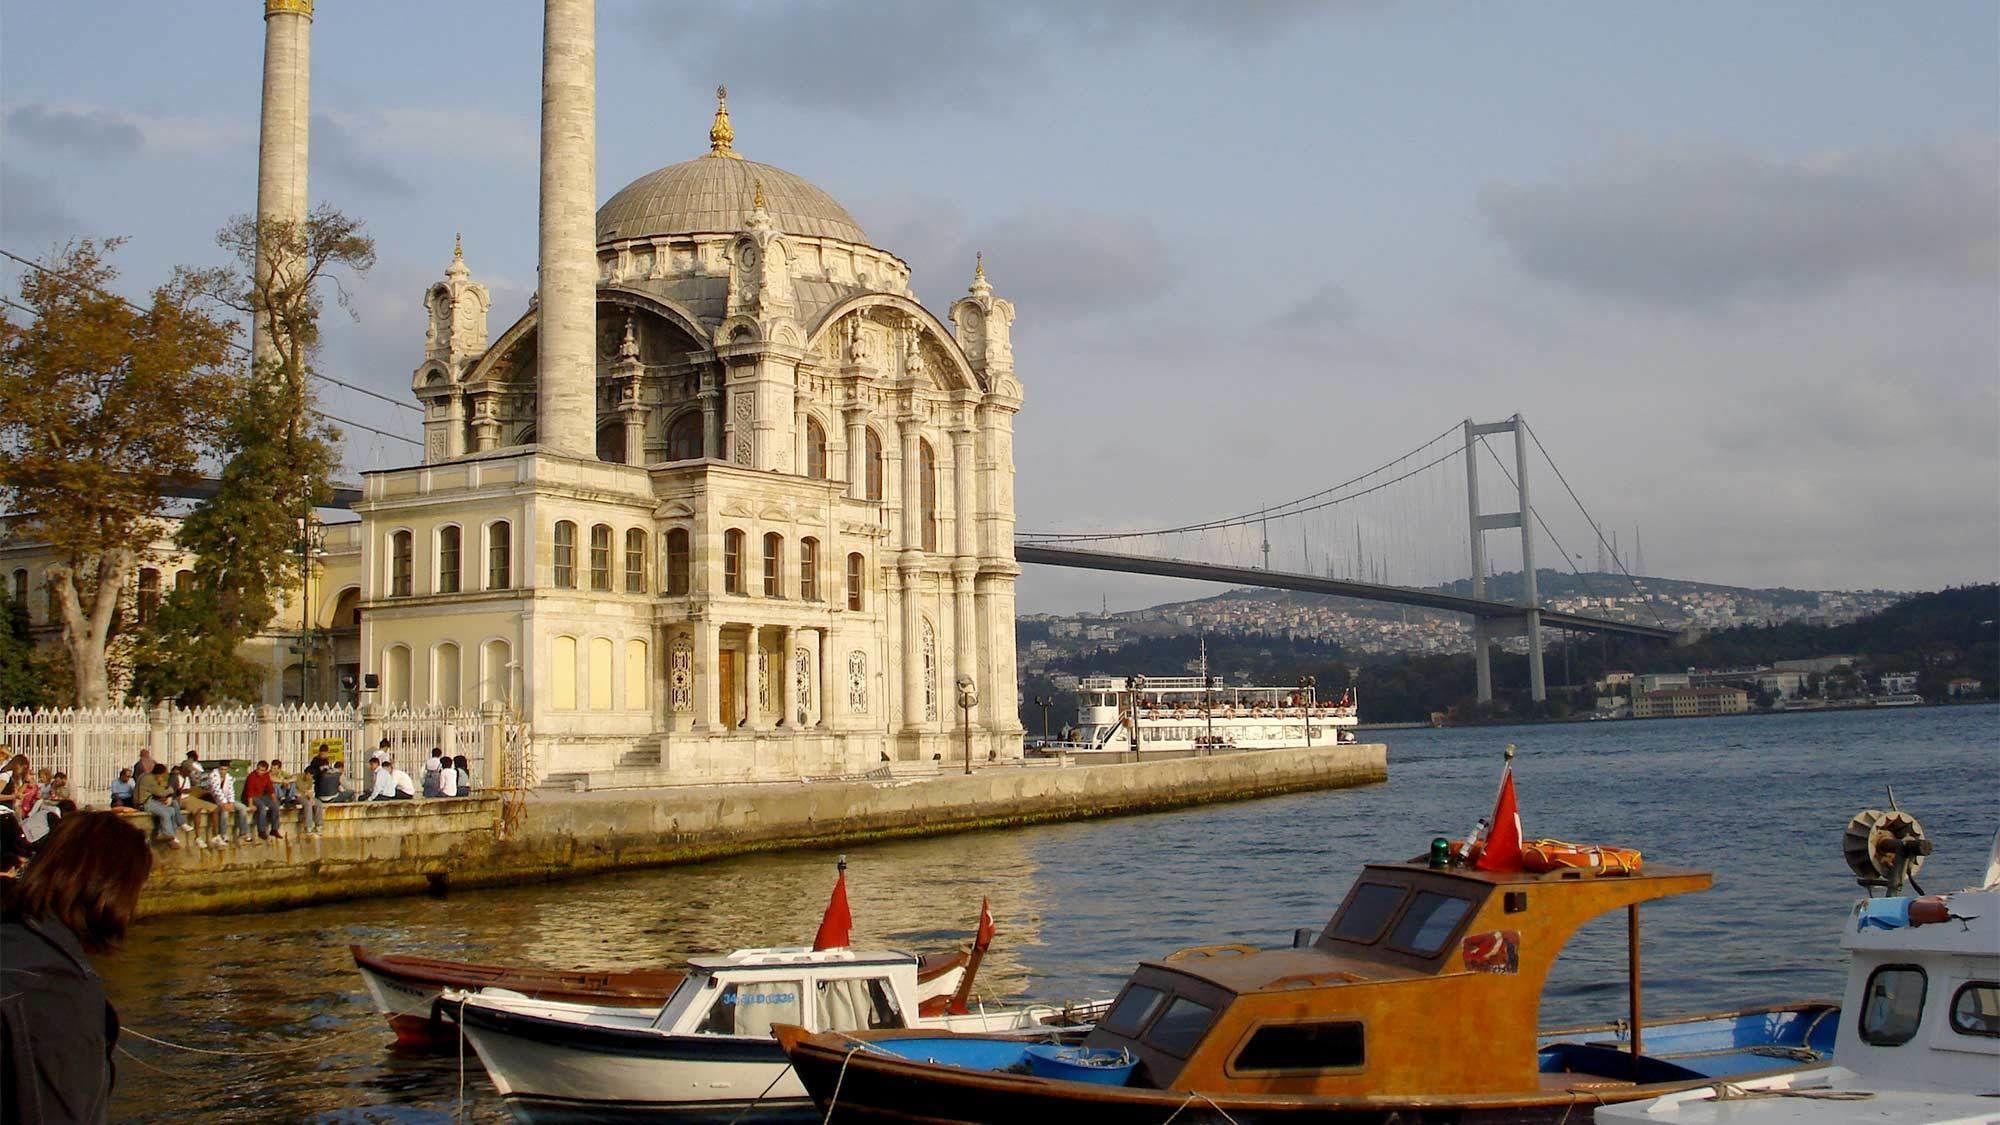 Istanbul Old City & Spice Bazaar with Bosphorus Cruise